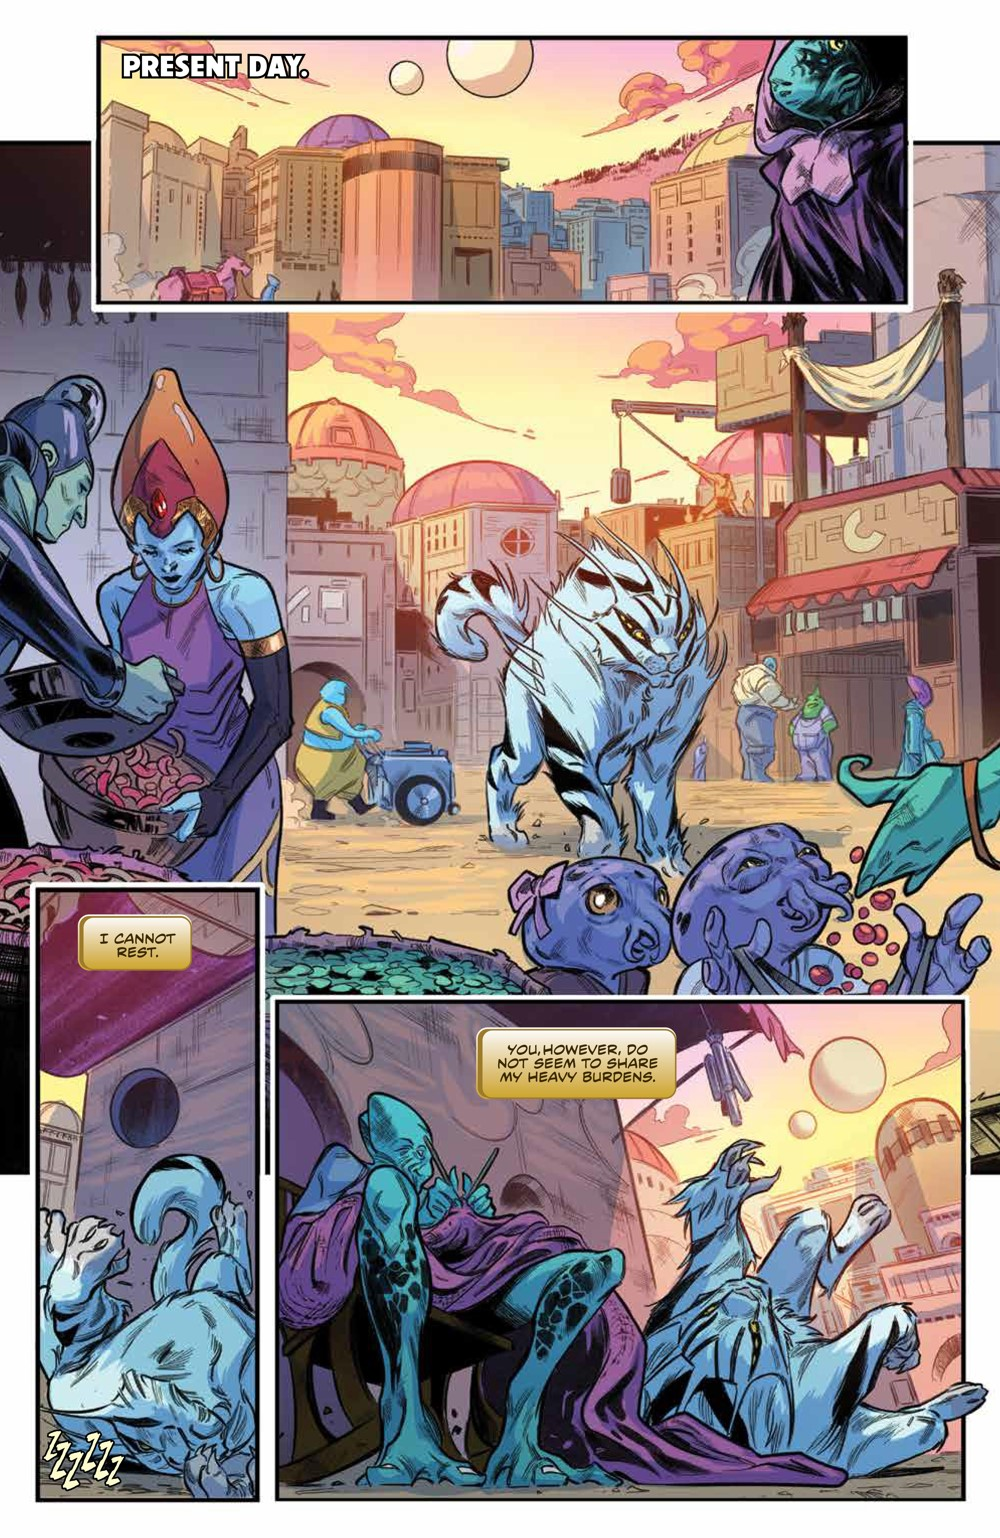 PowerRangers_010_PRESS_6 ComicList Previews: POWER RANGERS #10